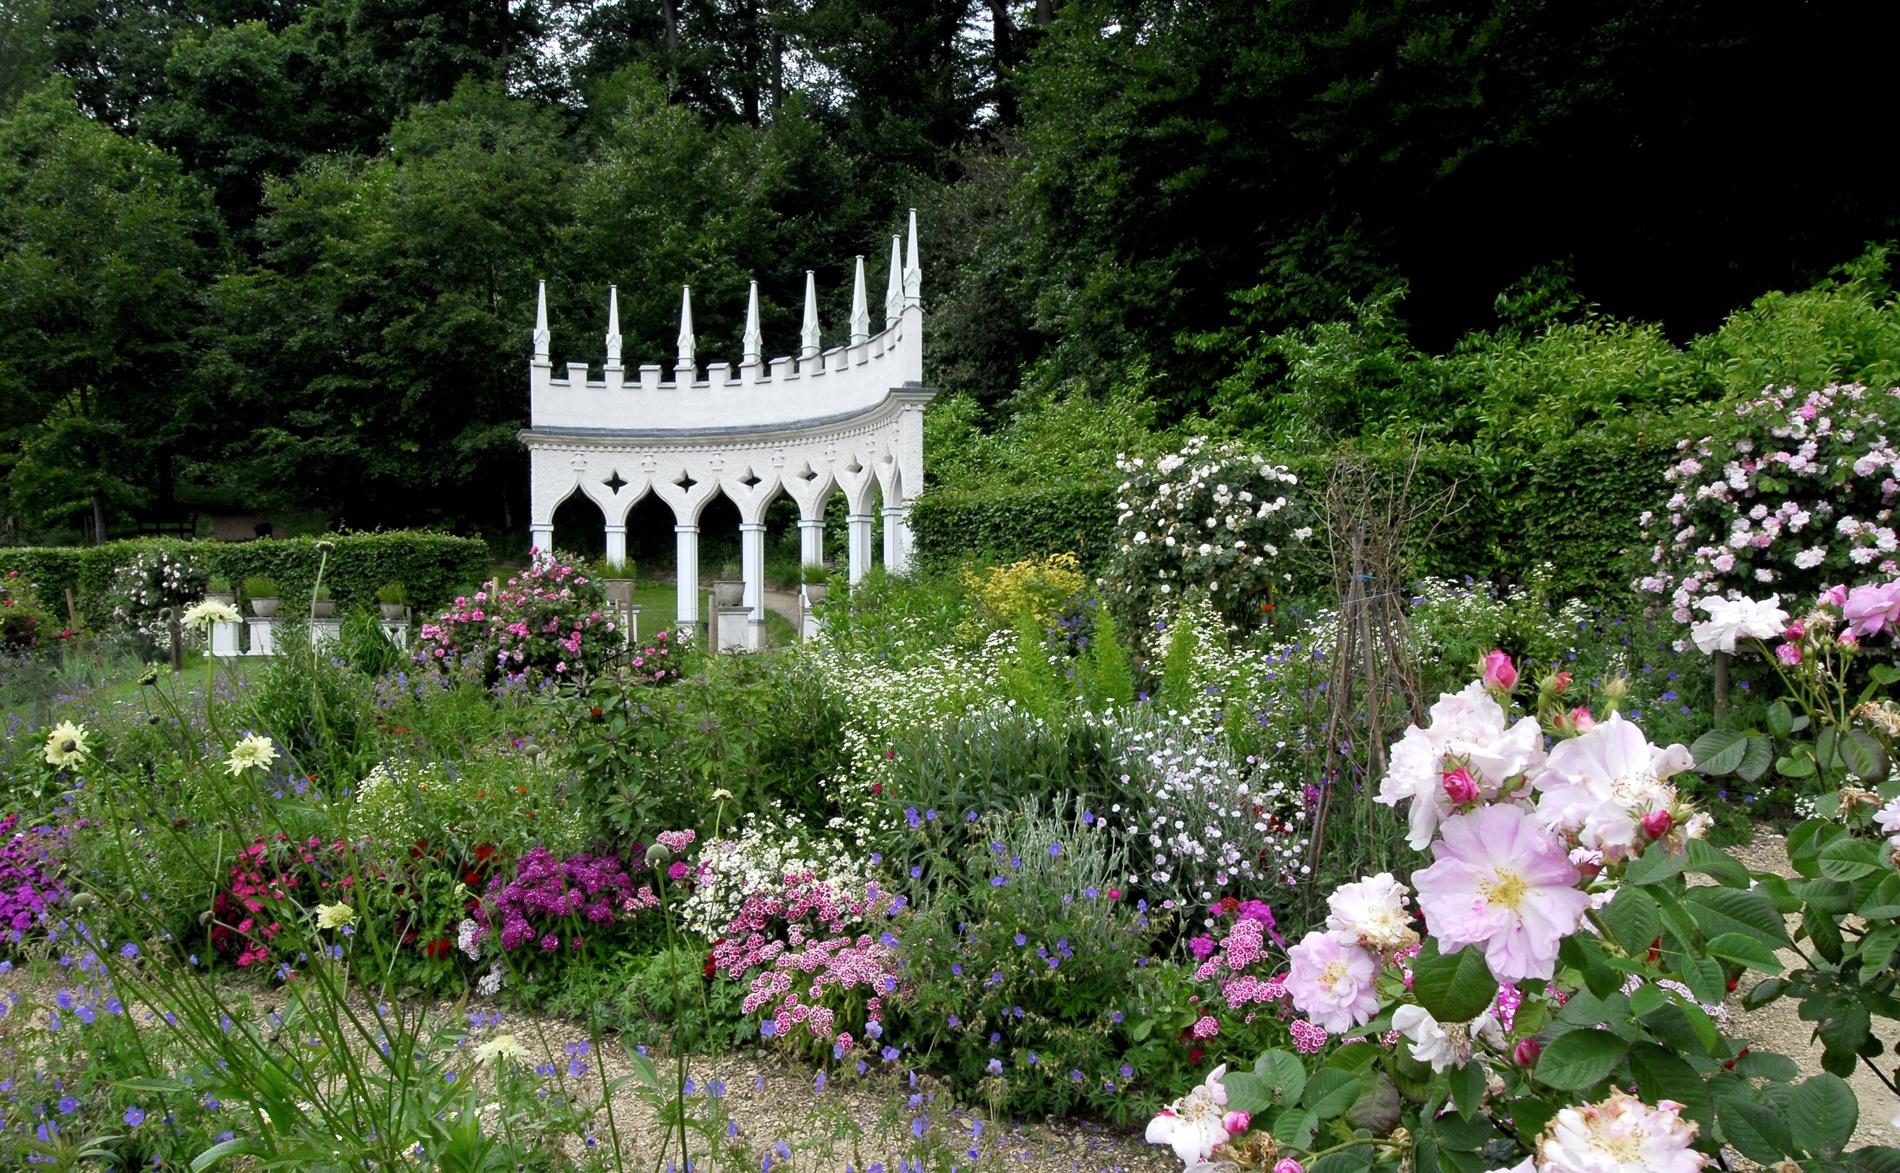 roccoco gardens.jpg